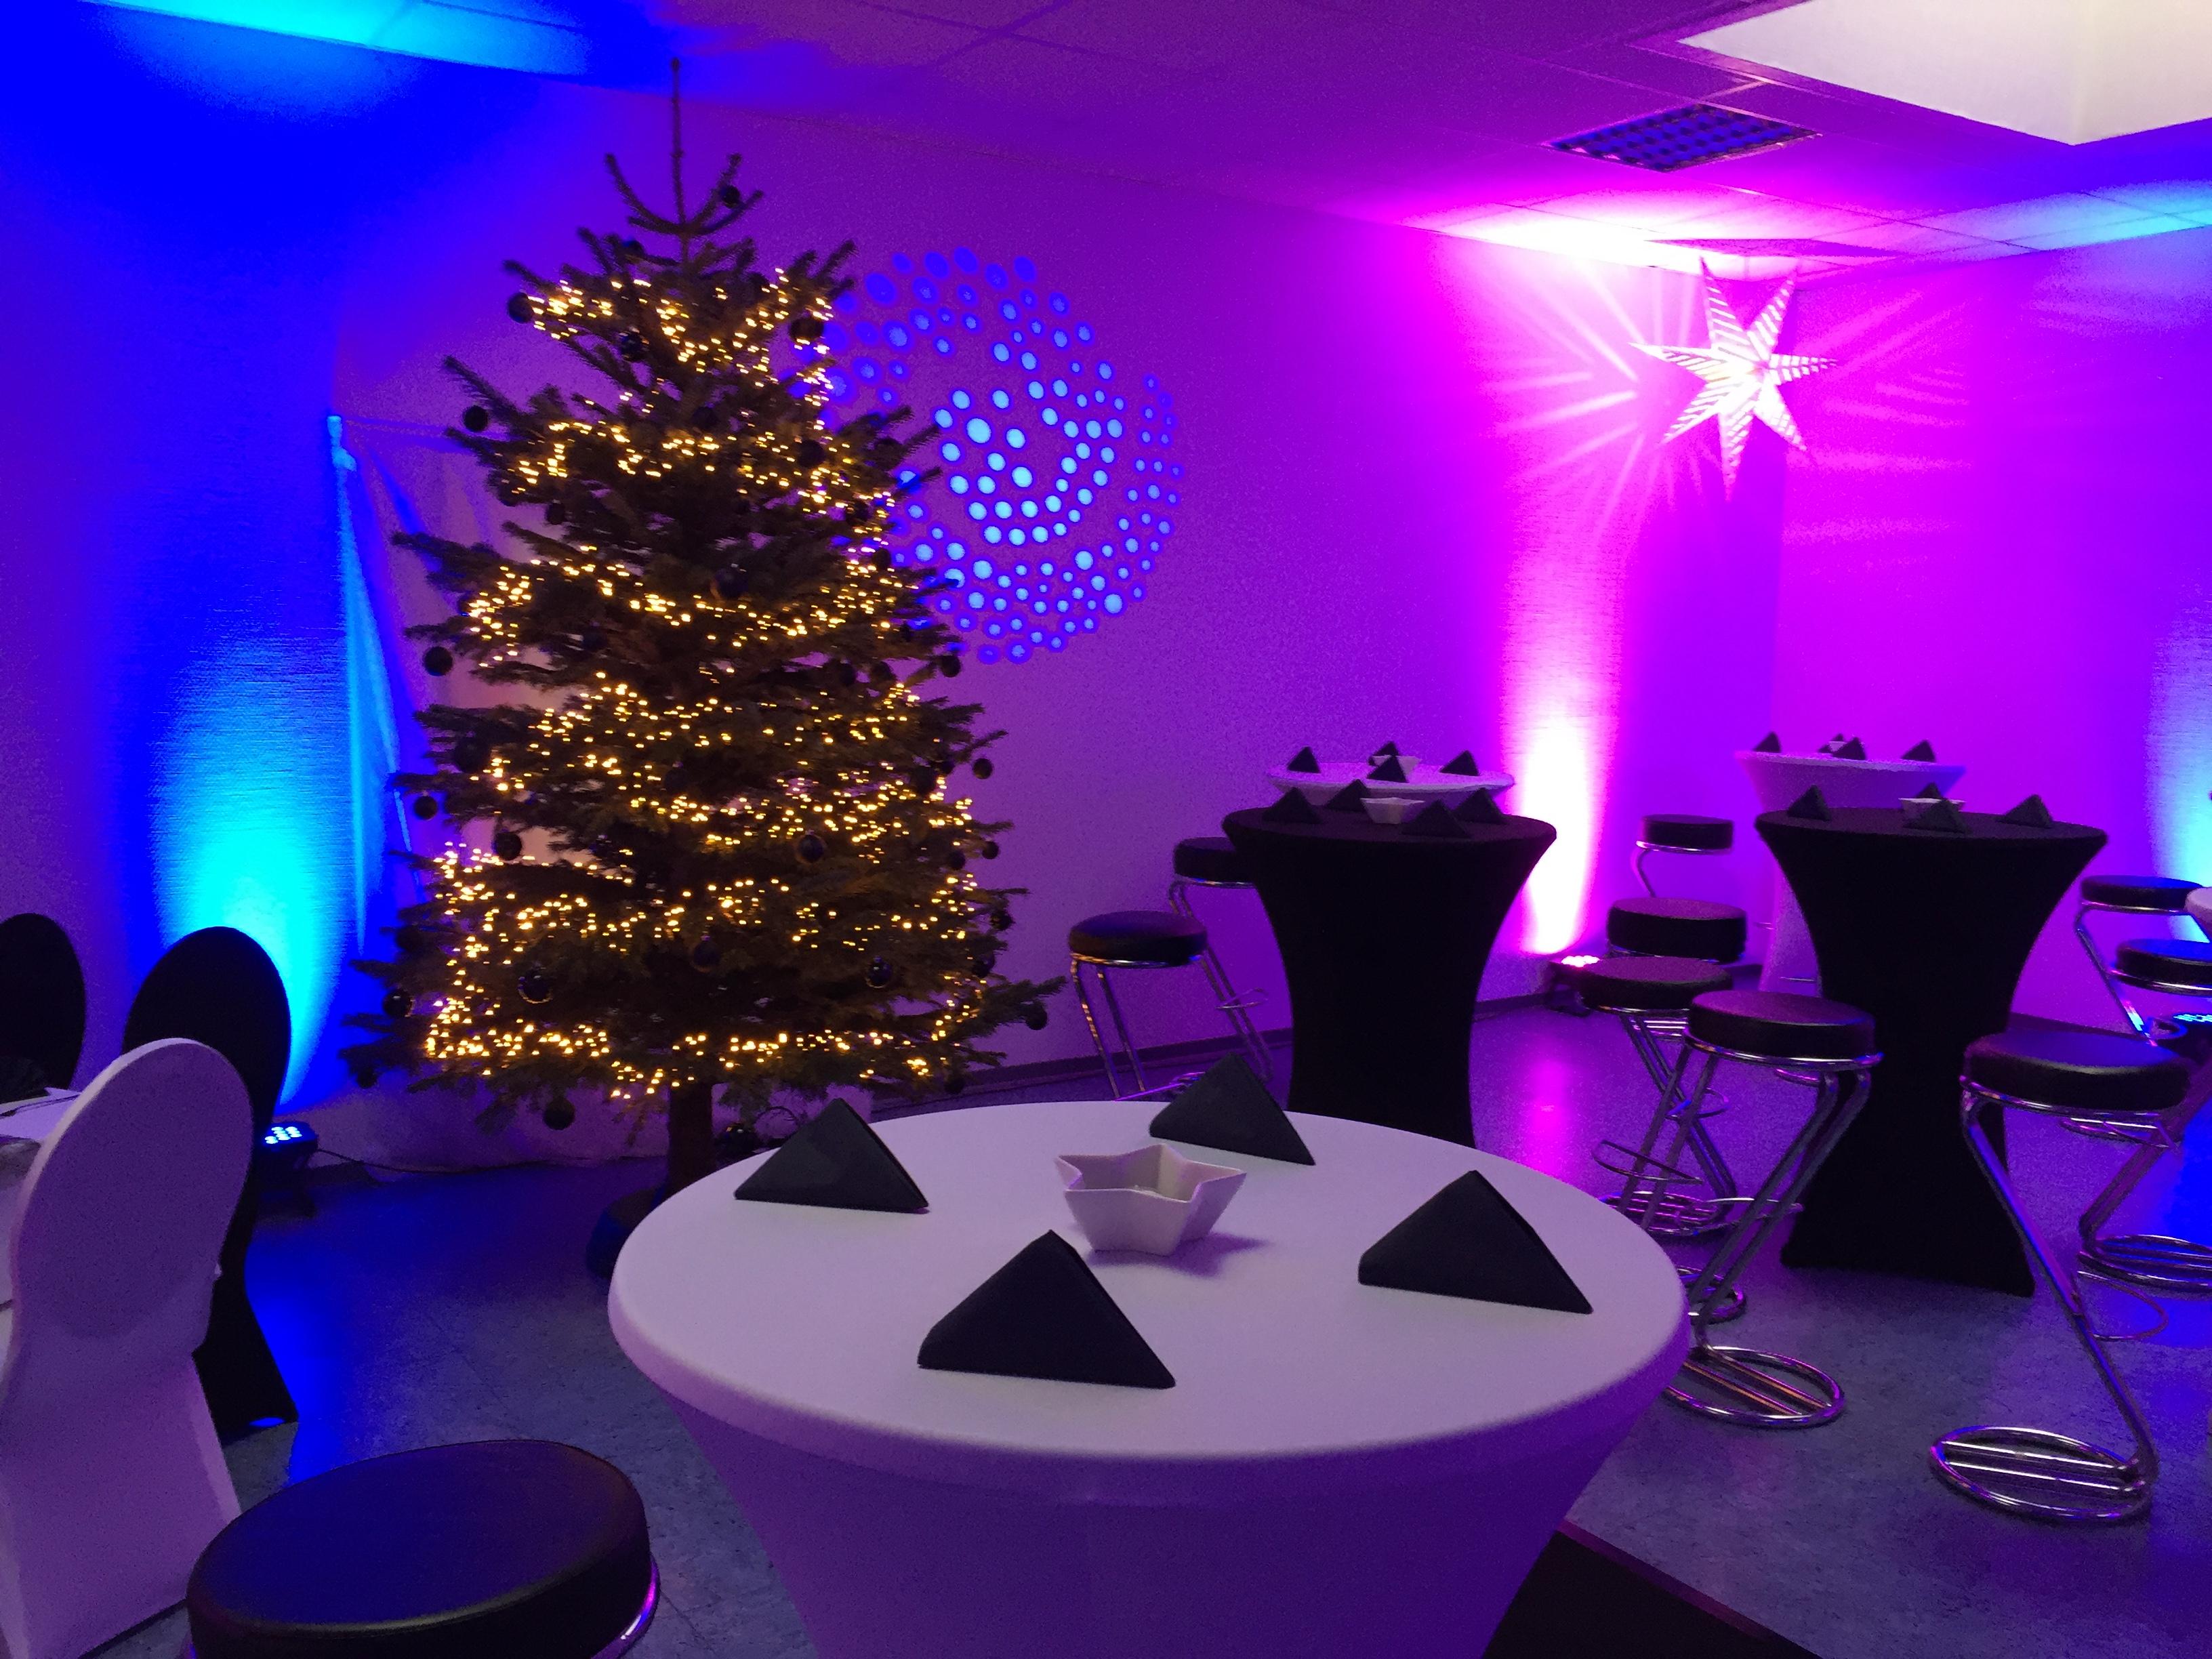 firmen weihnachtsfeier light 39 n 39 sound eventtechnik. Black Bedroom Furniture Sets. Home Design Ideas